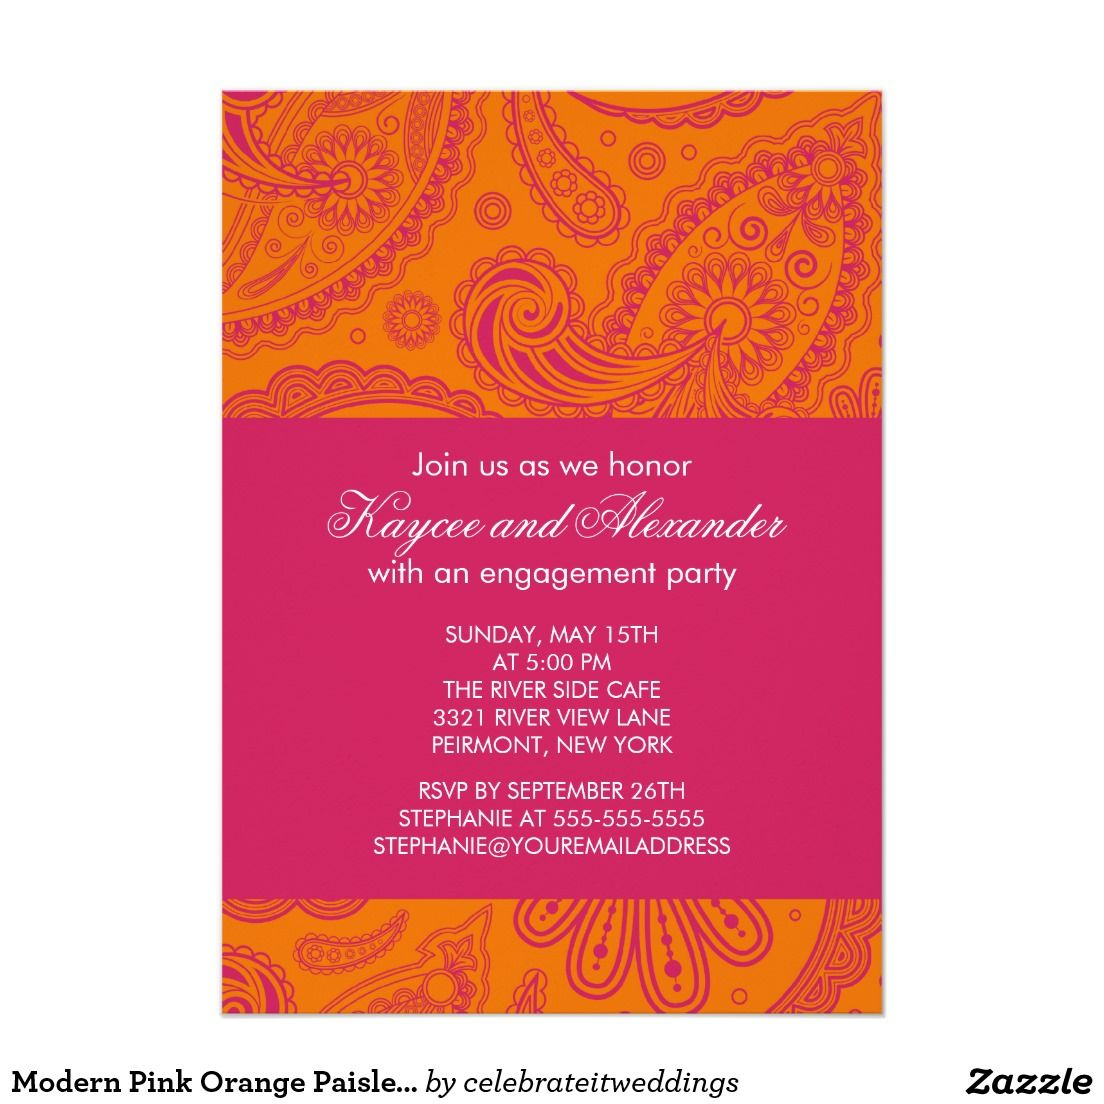 Modern Pink Orange Paisley Engagement Invitations   Wedding ...